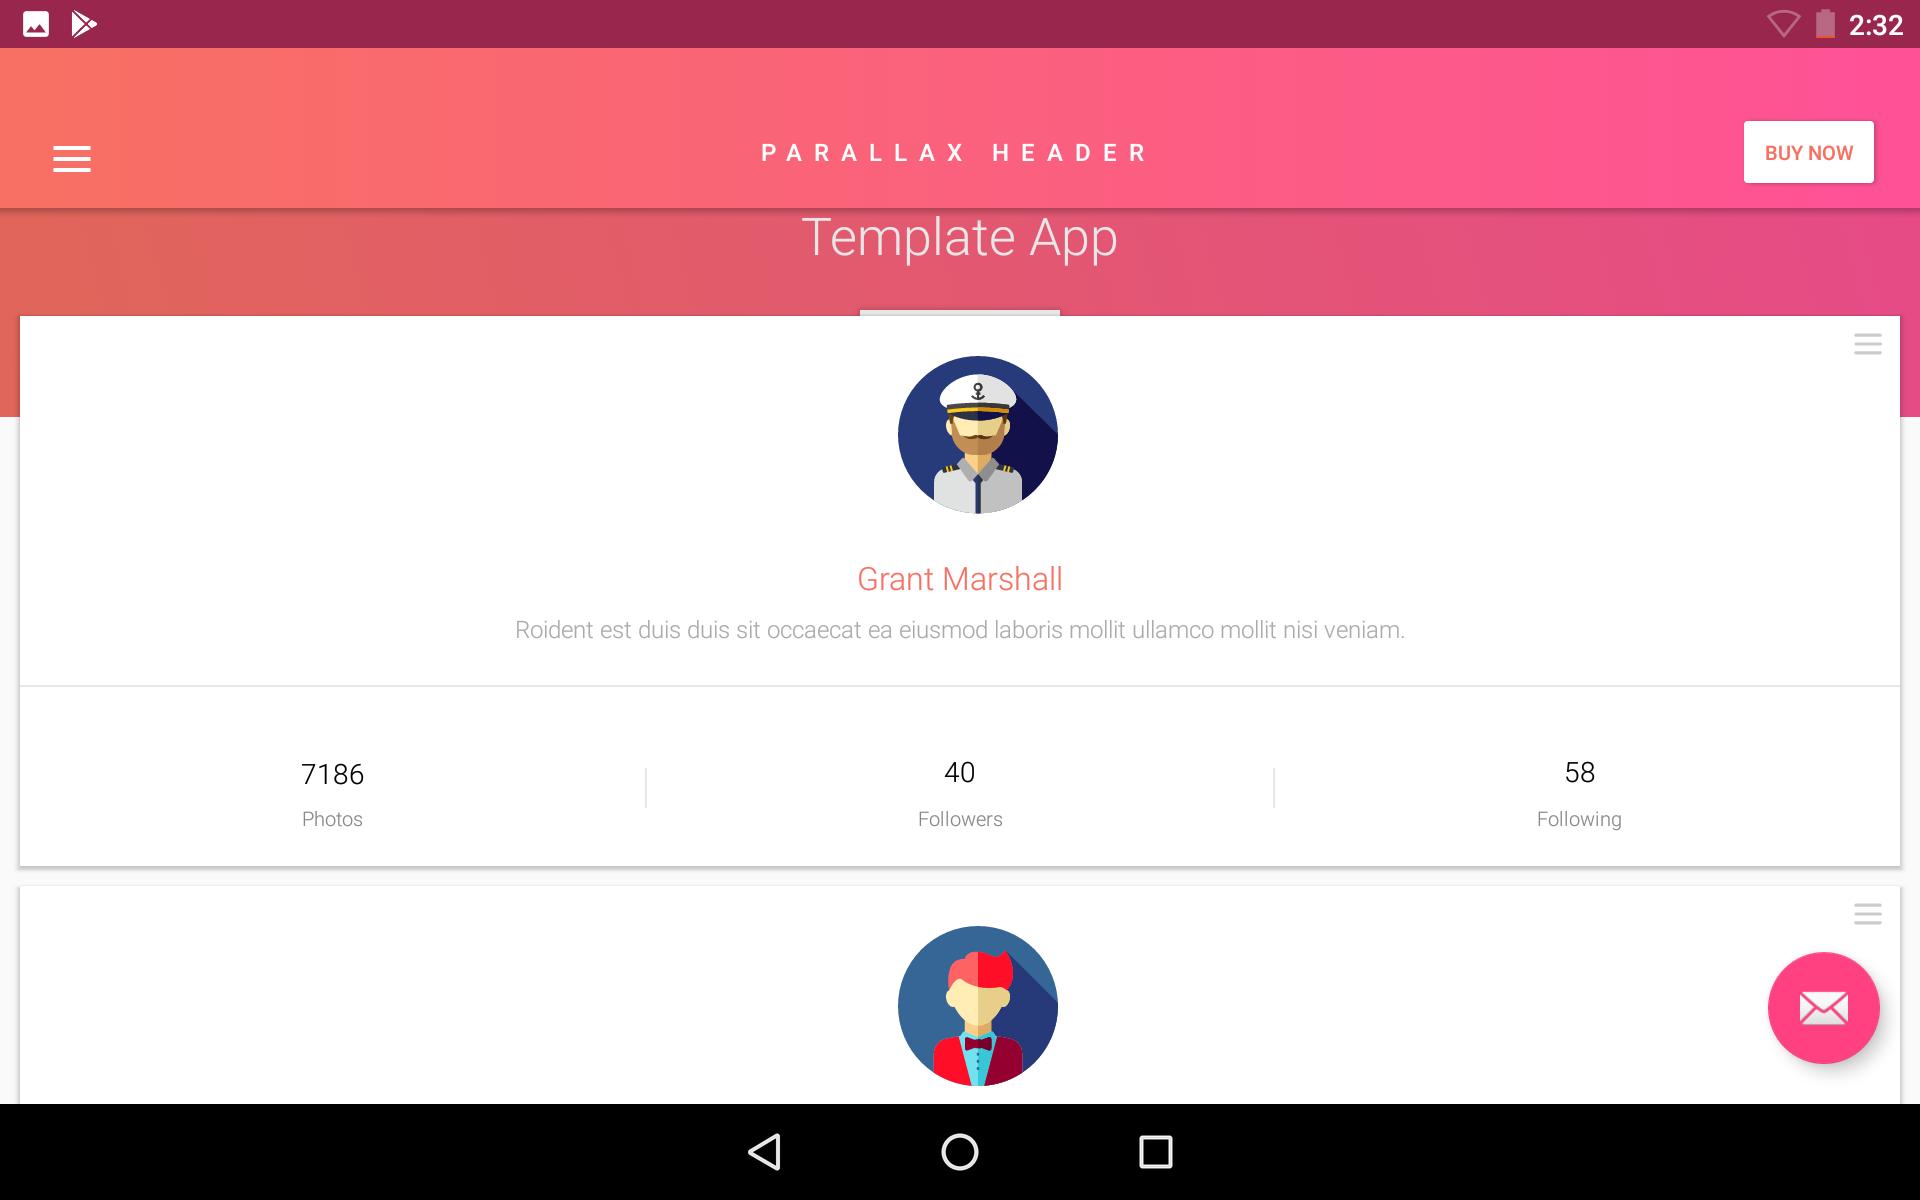 Matta material design android ui template theme app by creativeform 1 matta material design 2 ui android template theme expandable and swipe responsiveg reheart Gallery